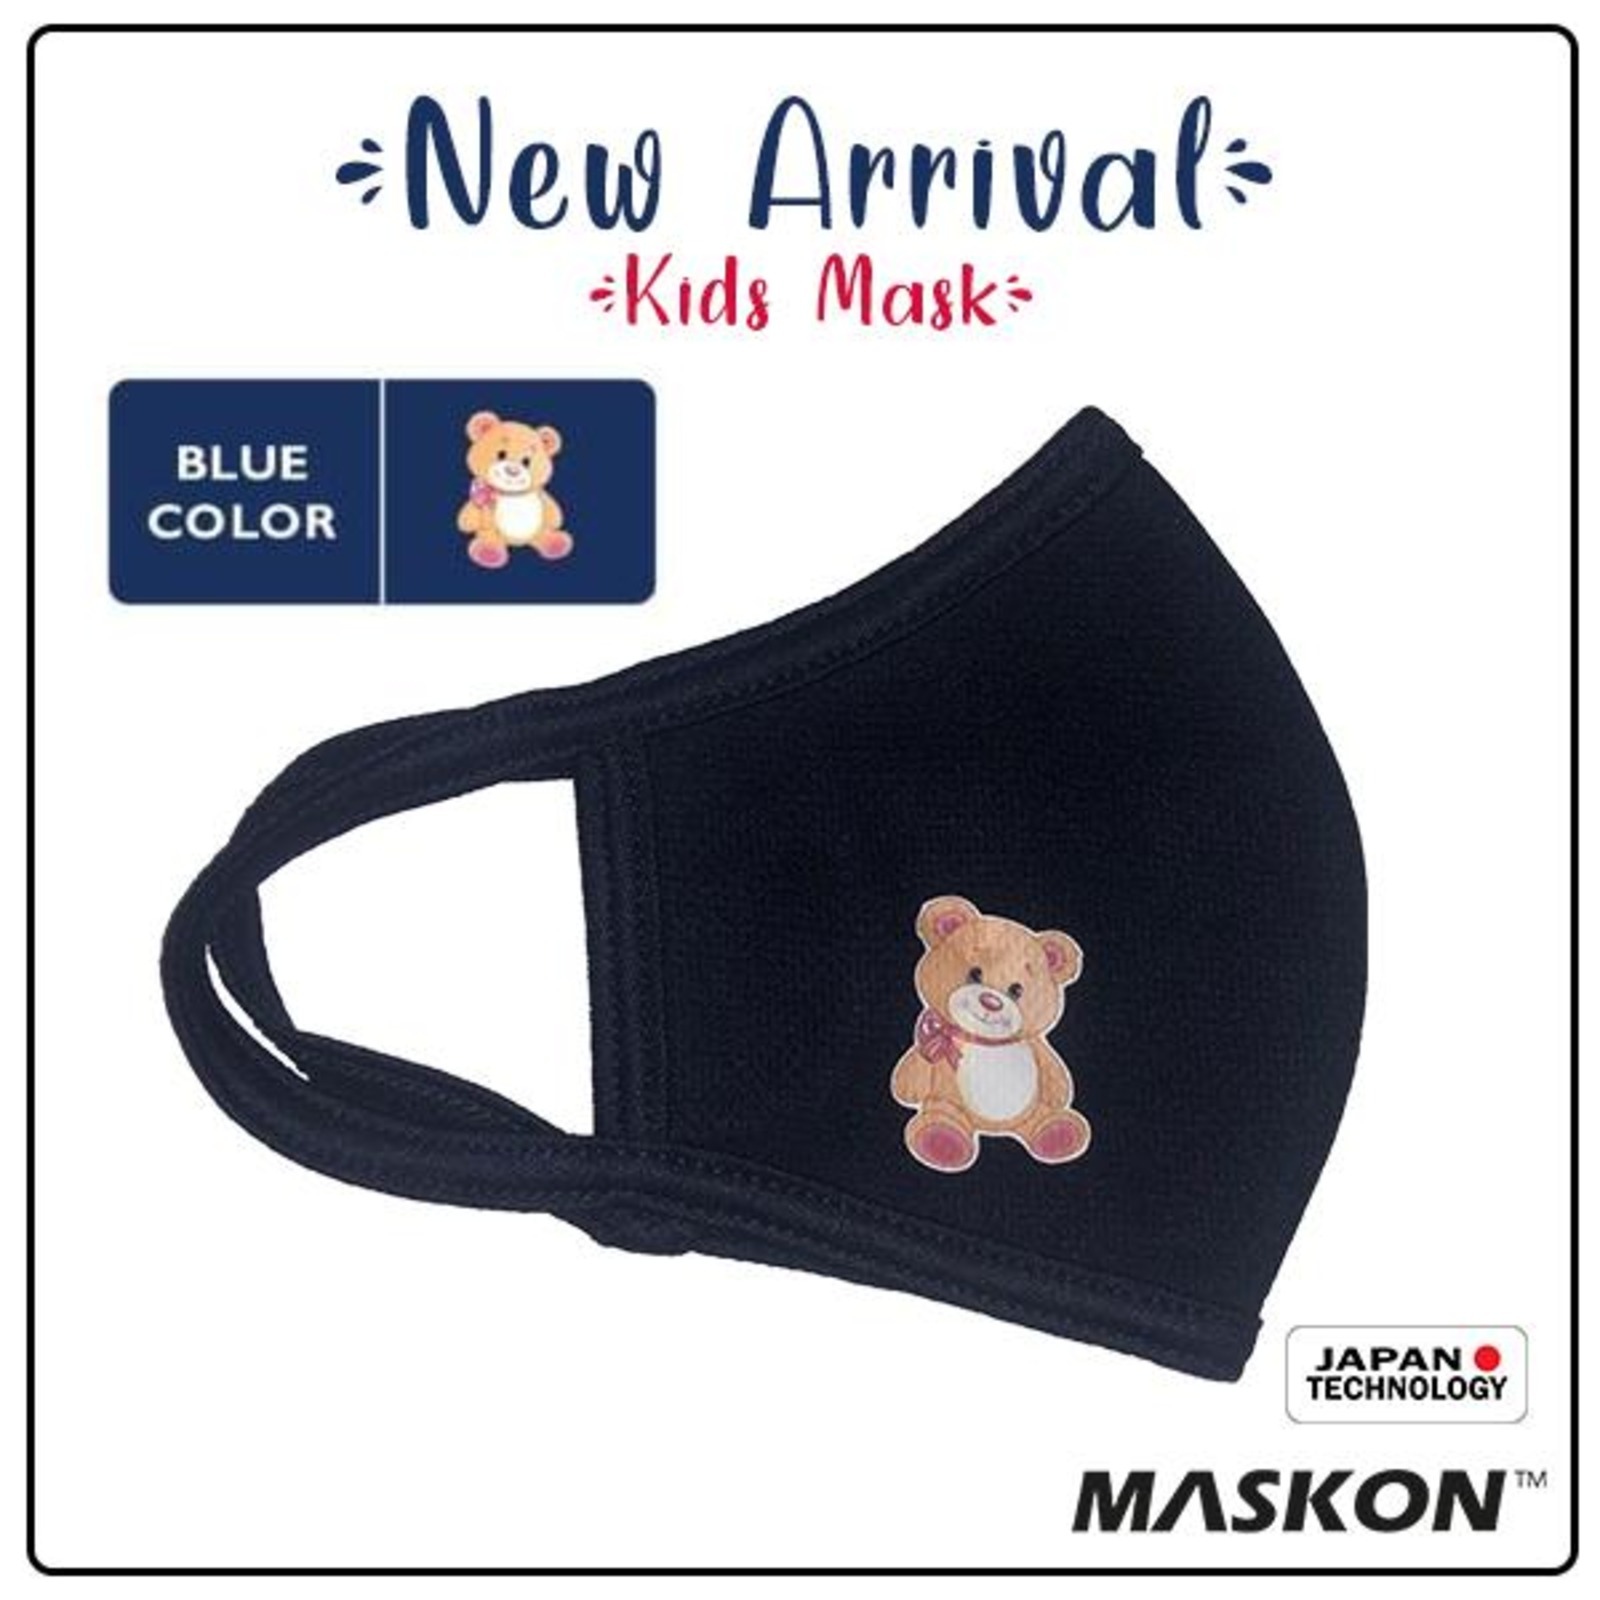 MaskOn Antimicrobial Face Mask - Kids (NAVY BLUE - BEAR)